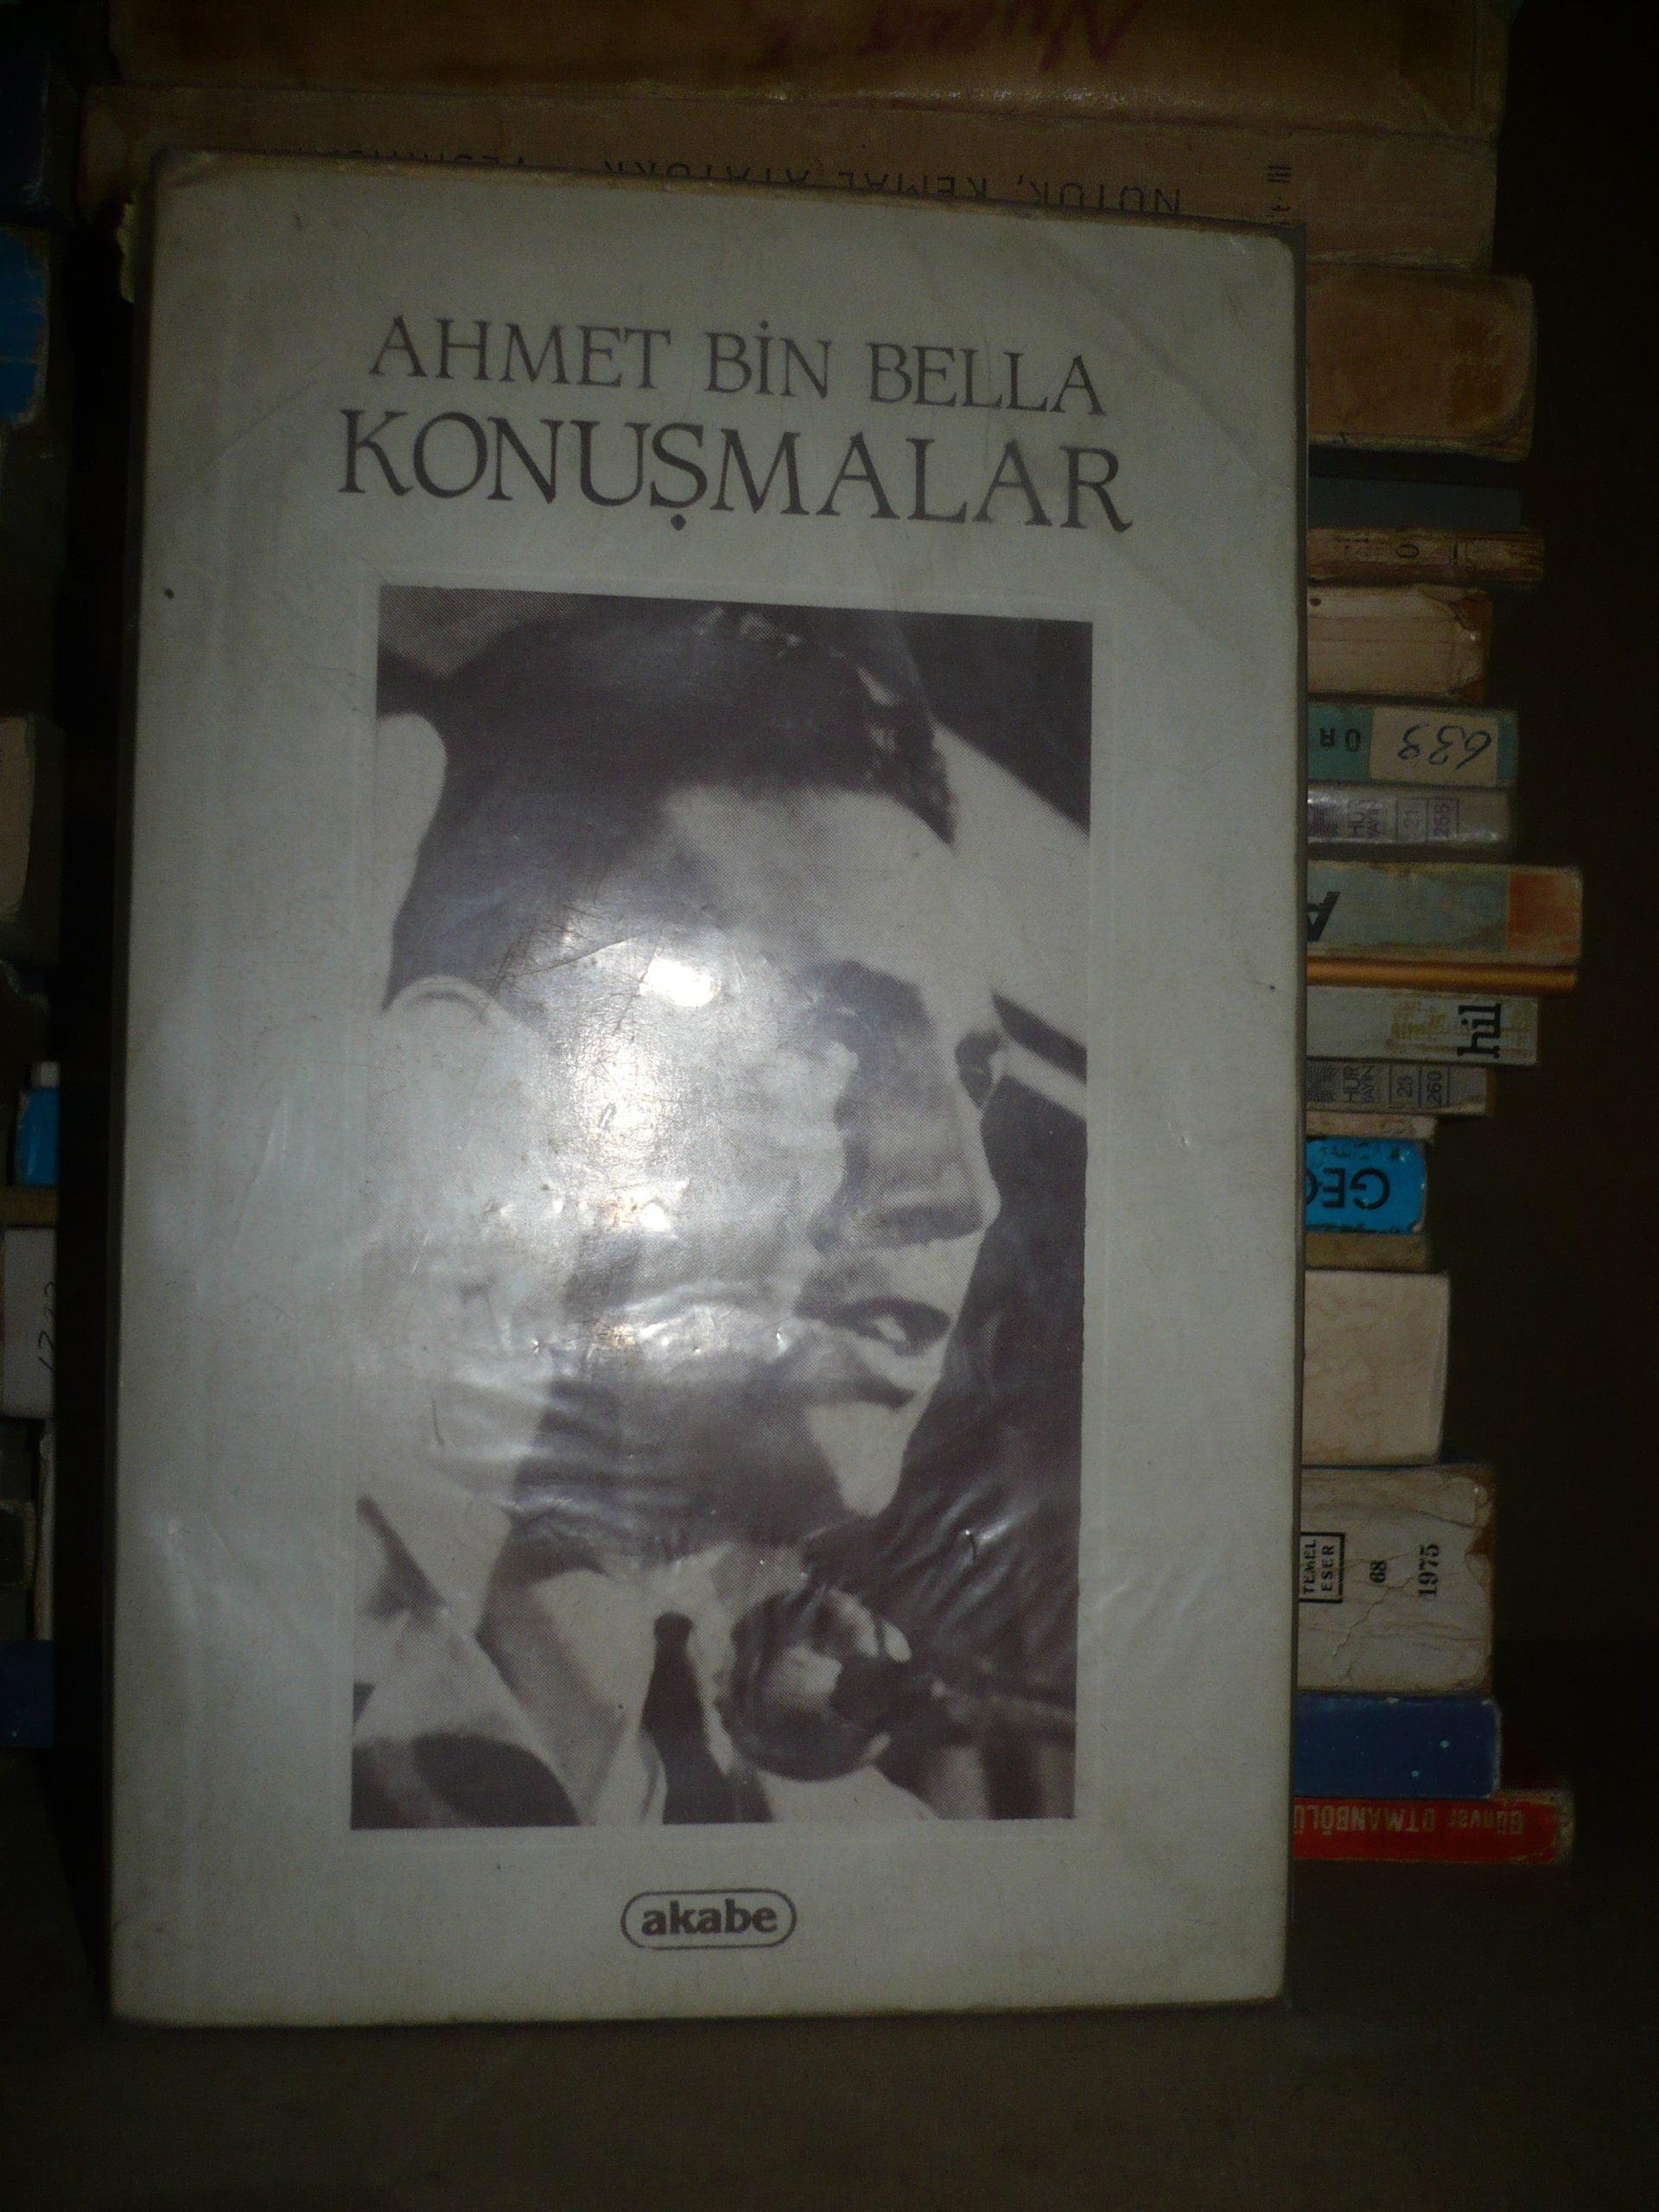 KONUŞMALAR/Ahmet Bin BELLA/20 tl